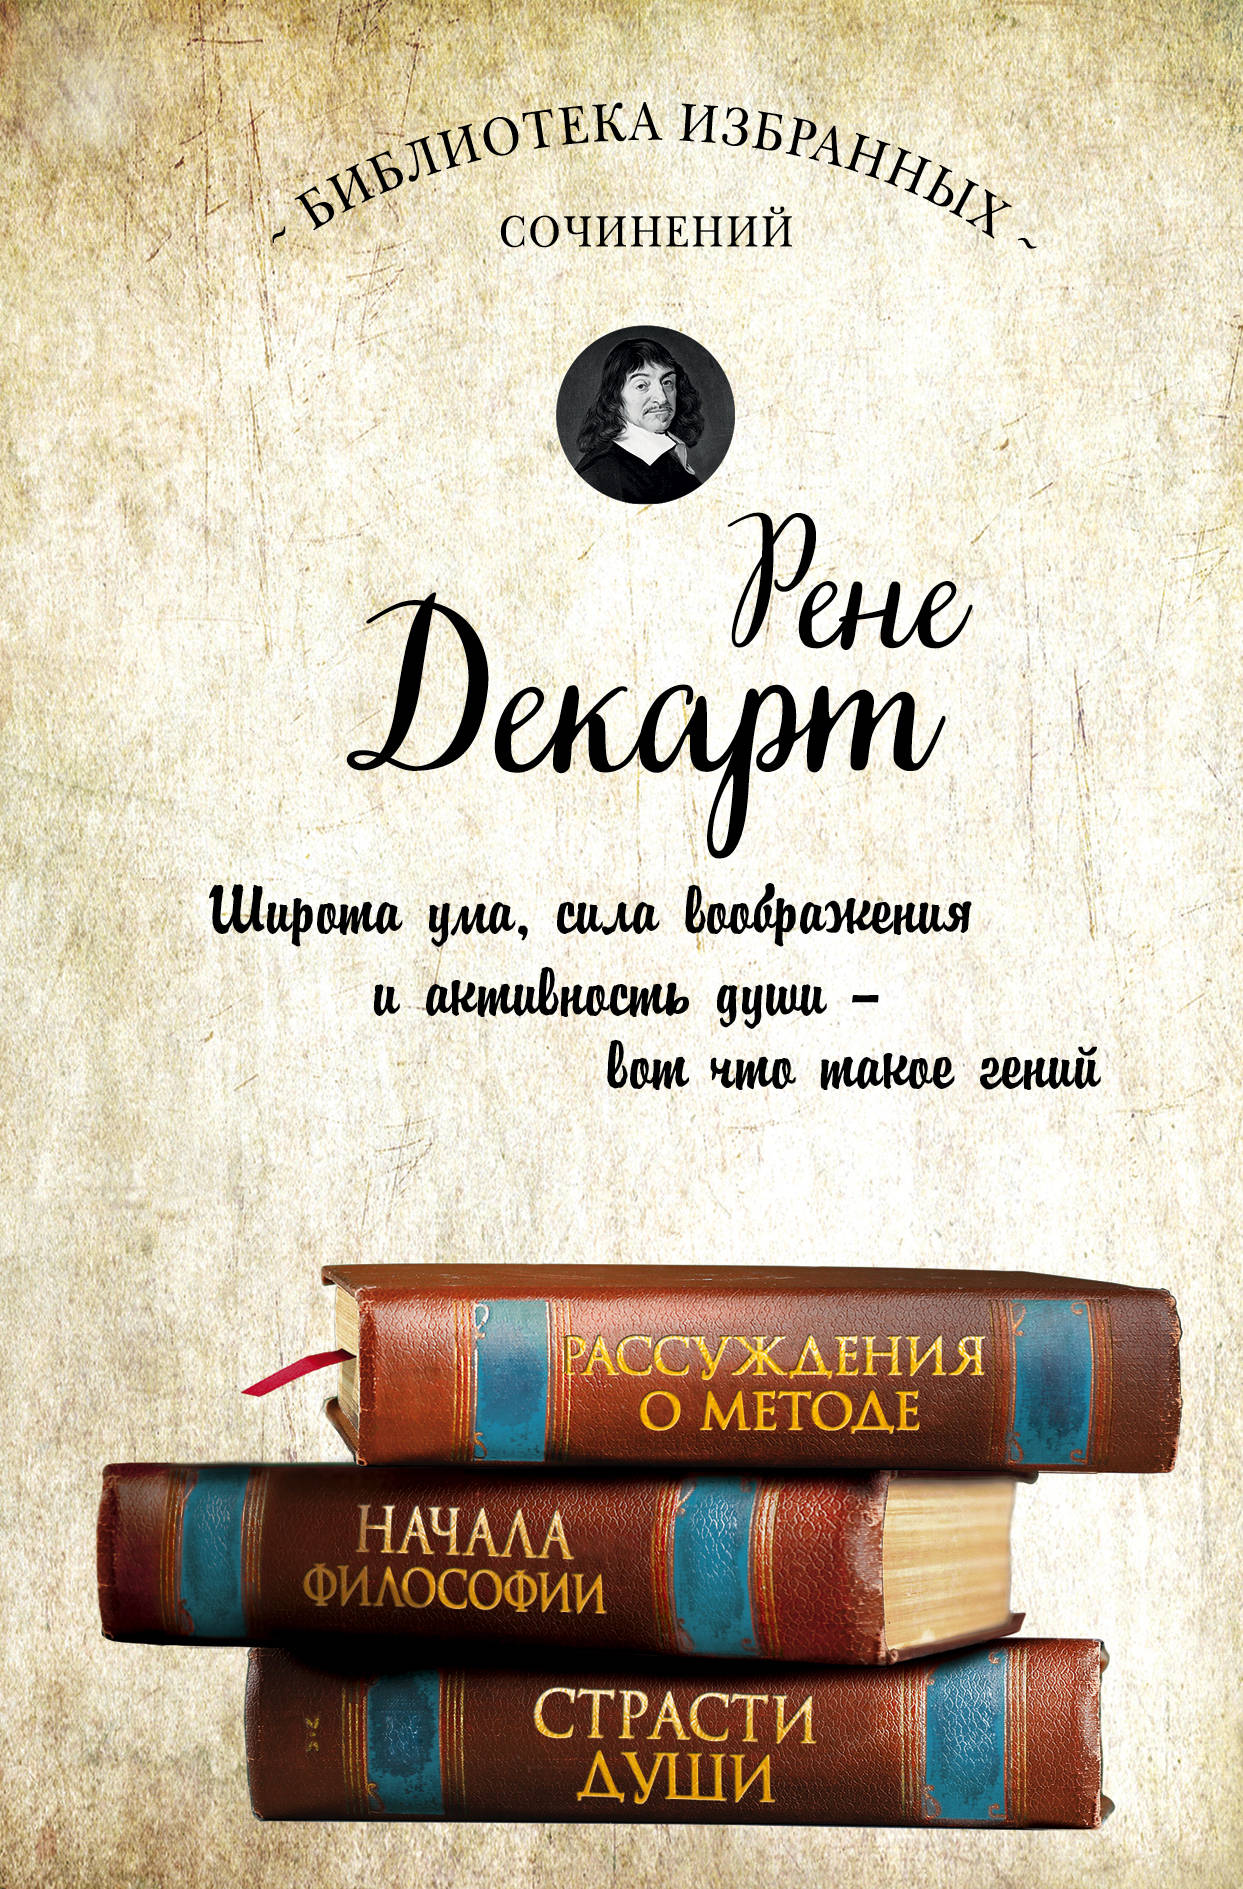 Декарт. Собрание сочинений